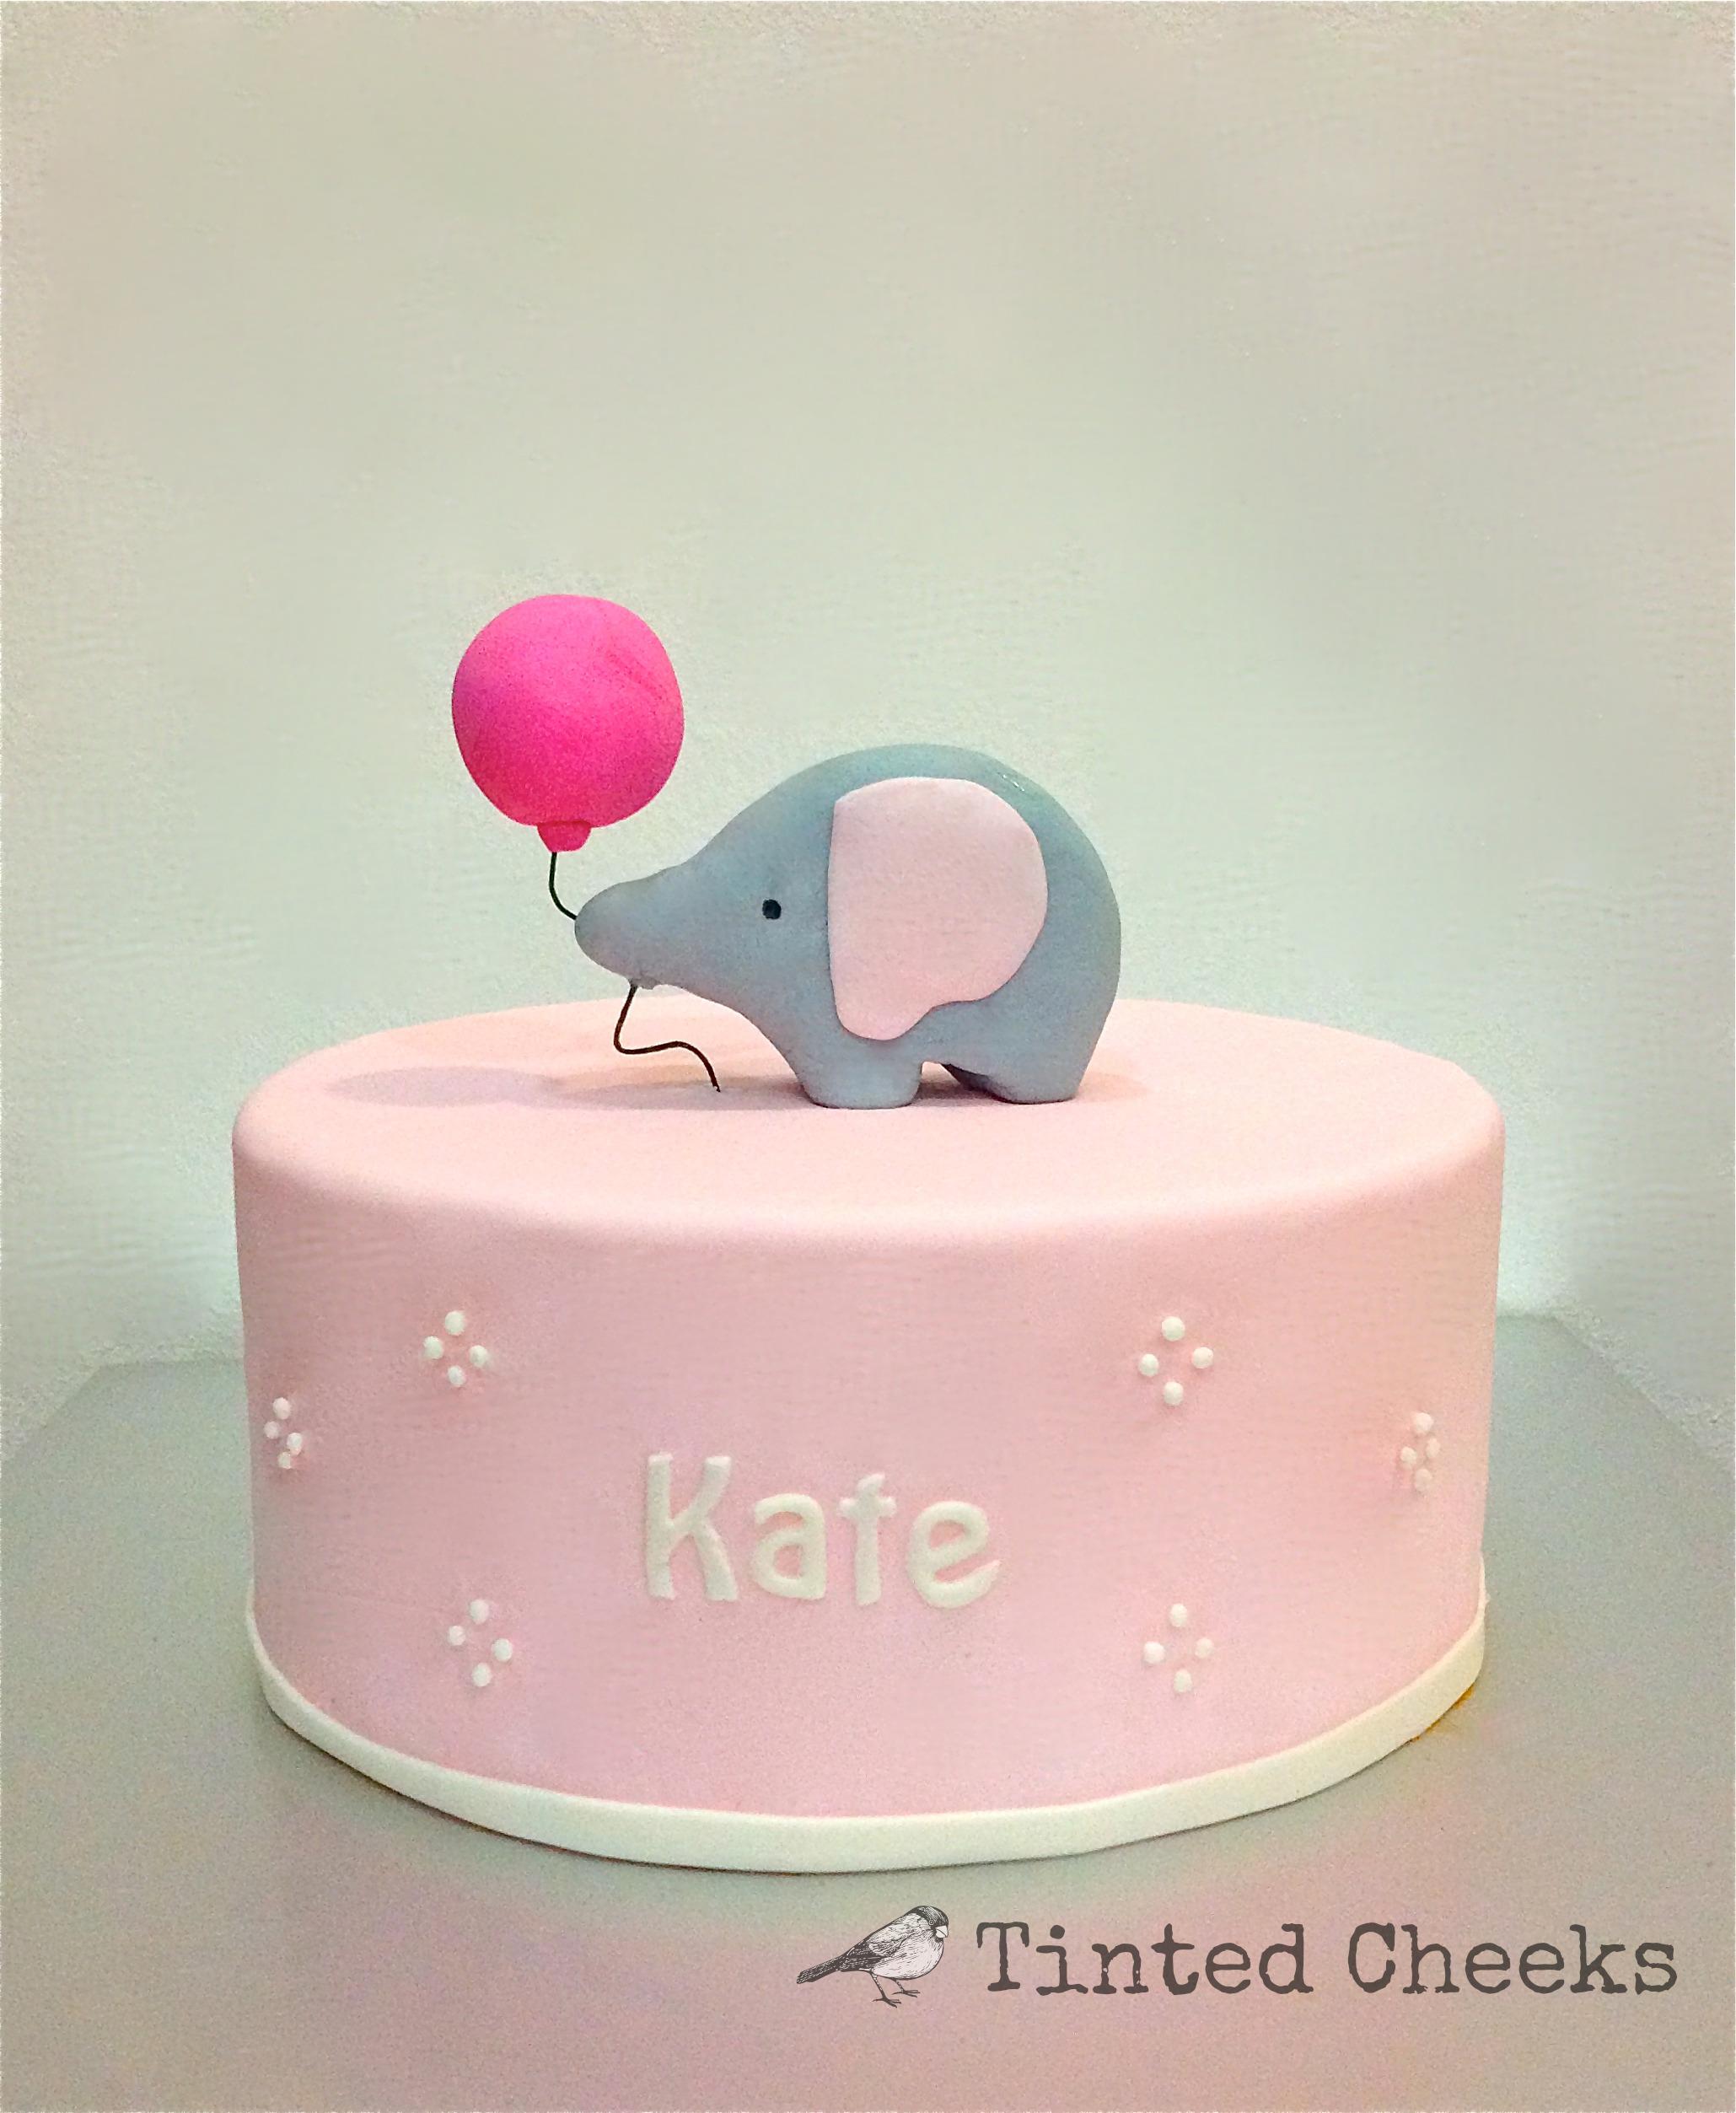 Baby Elephant Balloon Cake.jpg